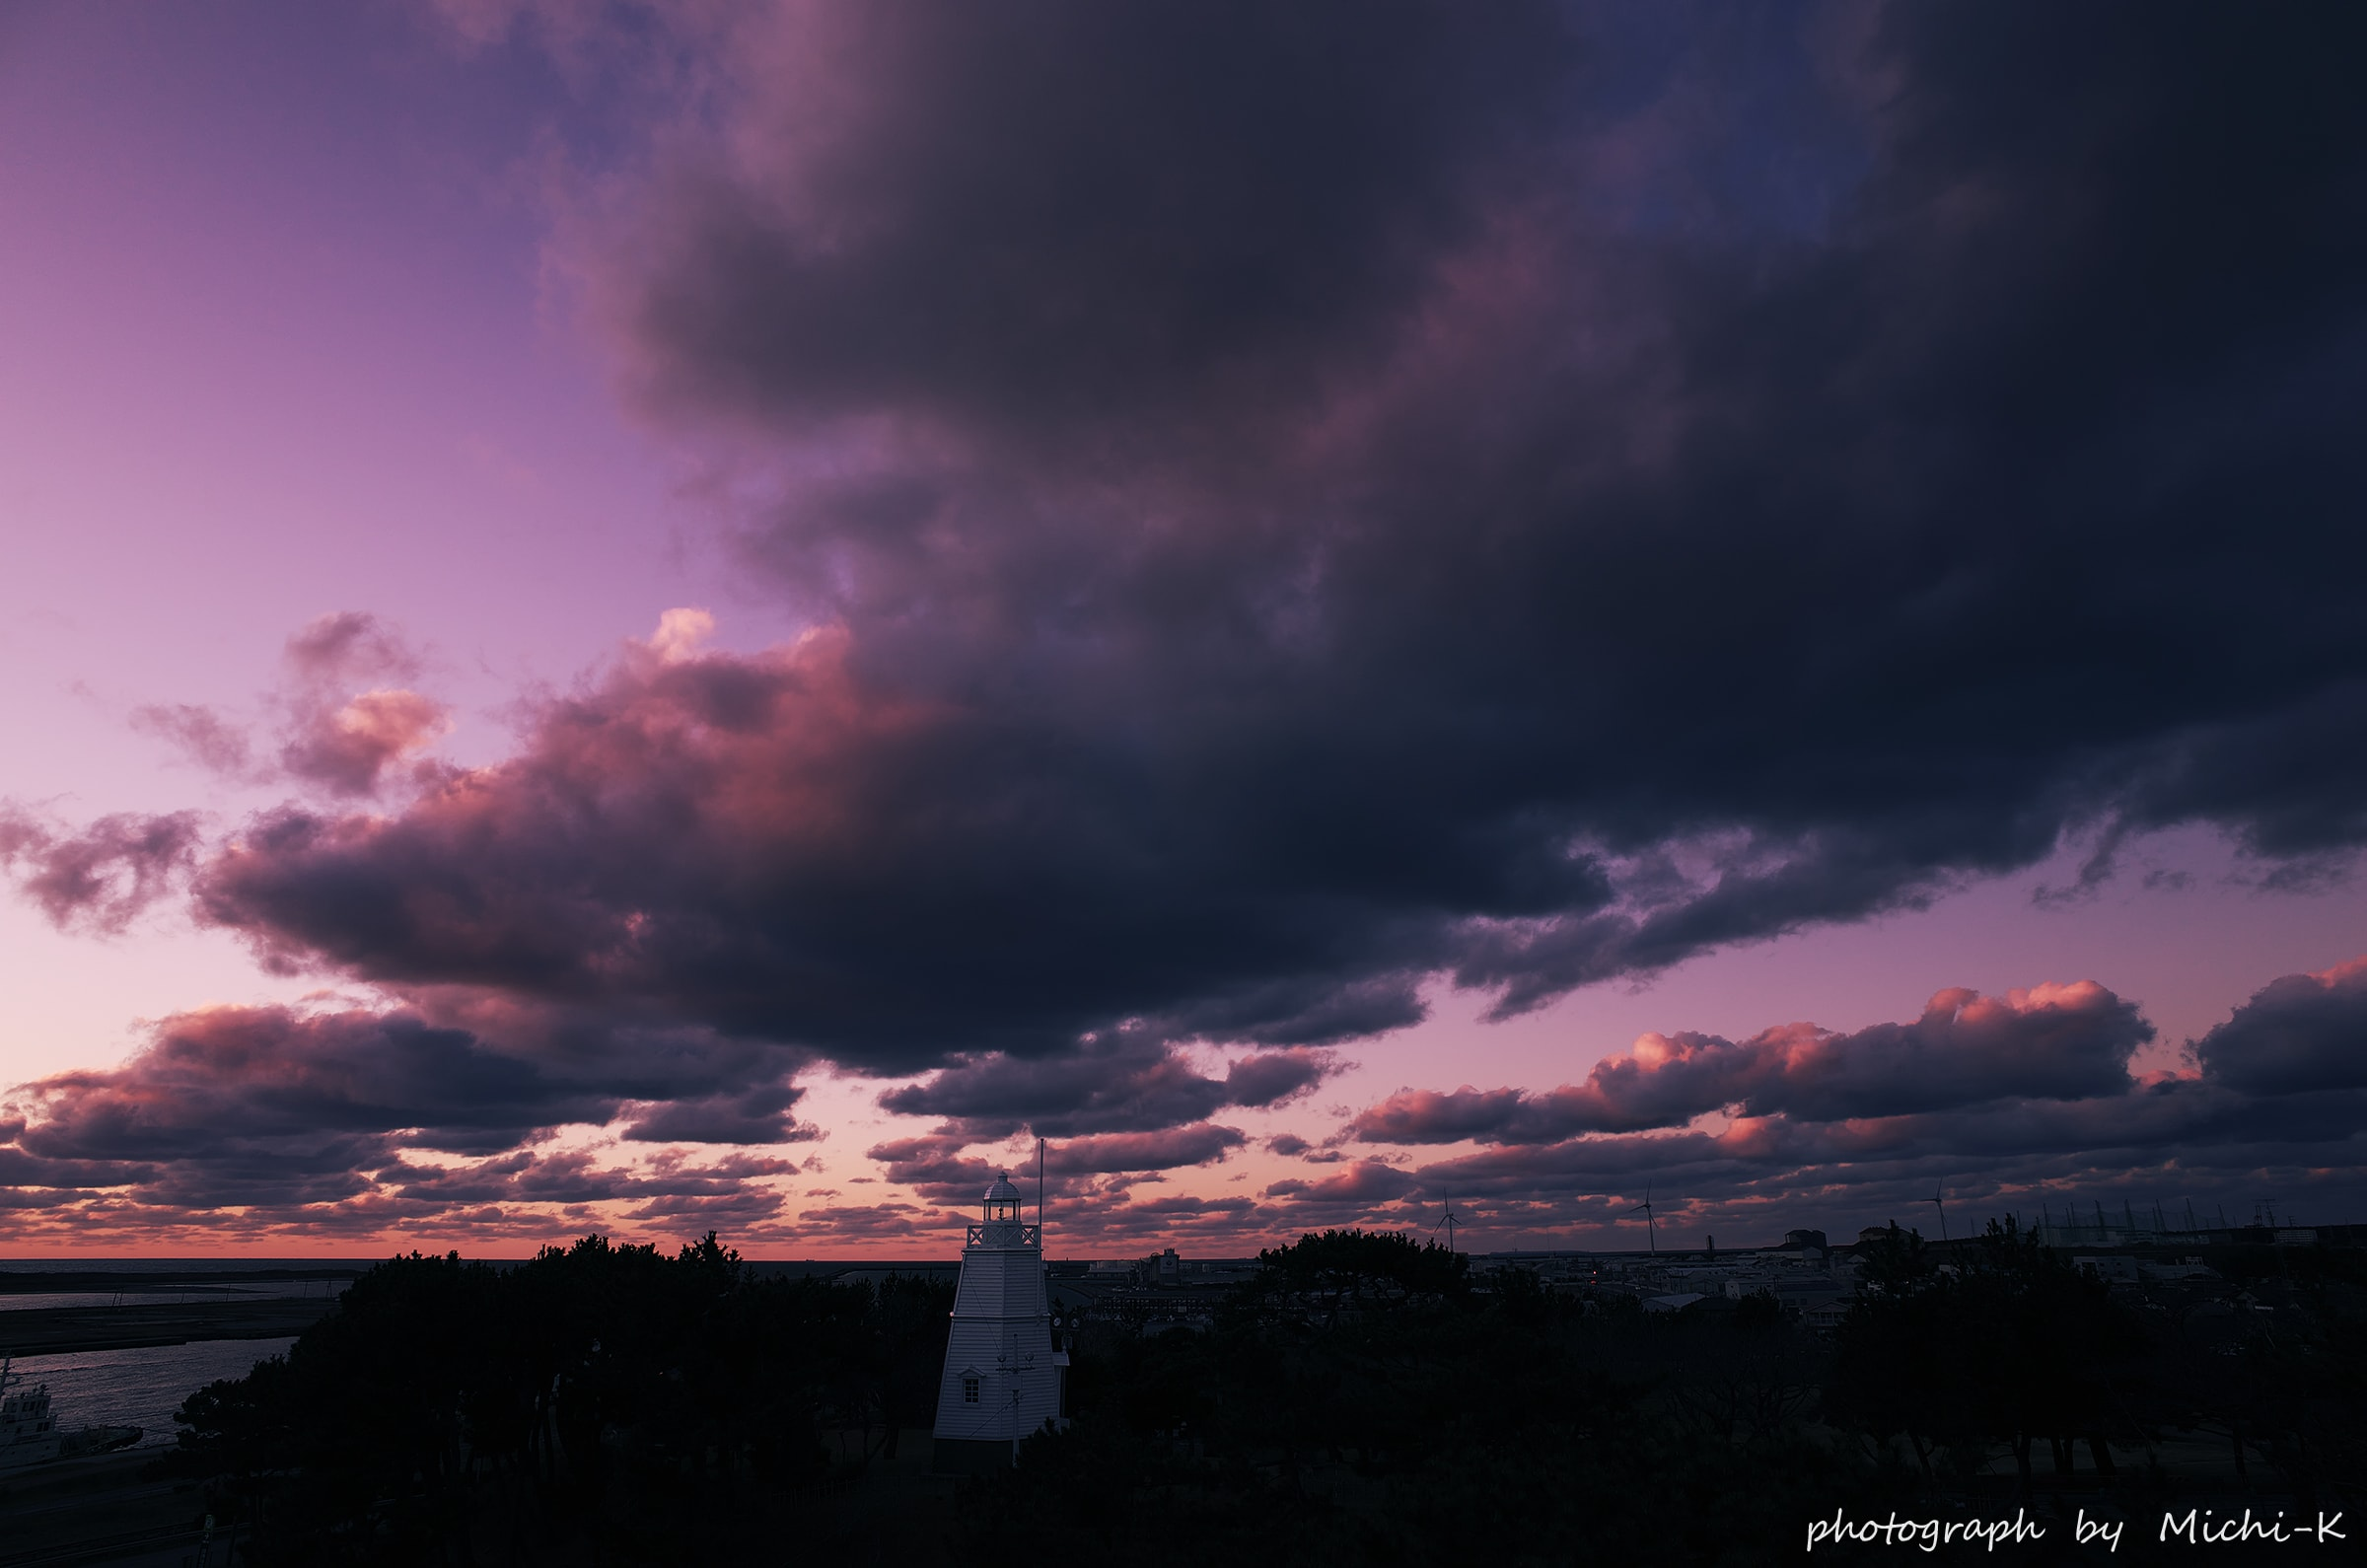 酒田市、日和山六角灯台と夕焼け